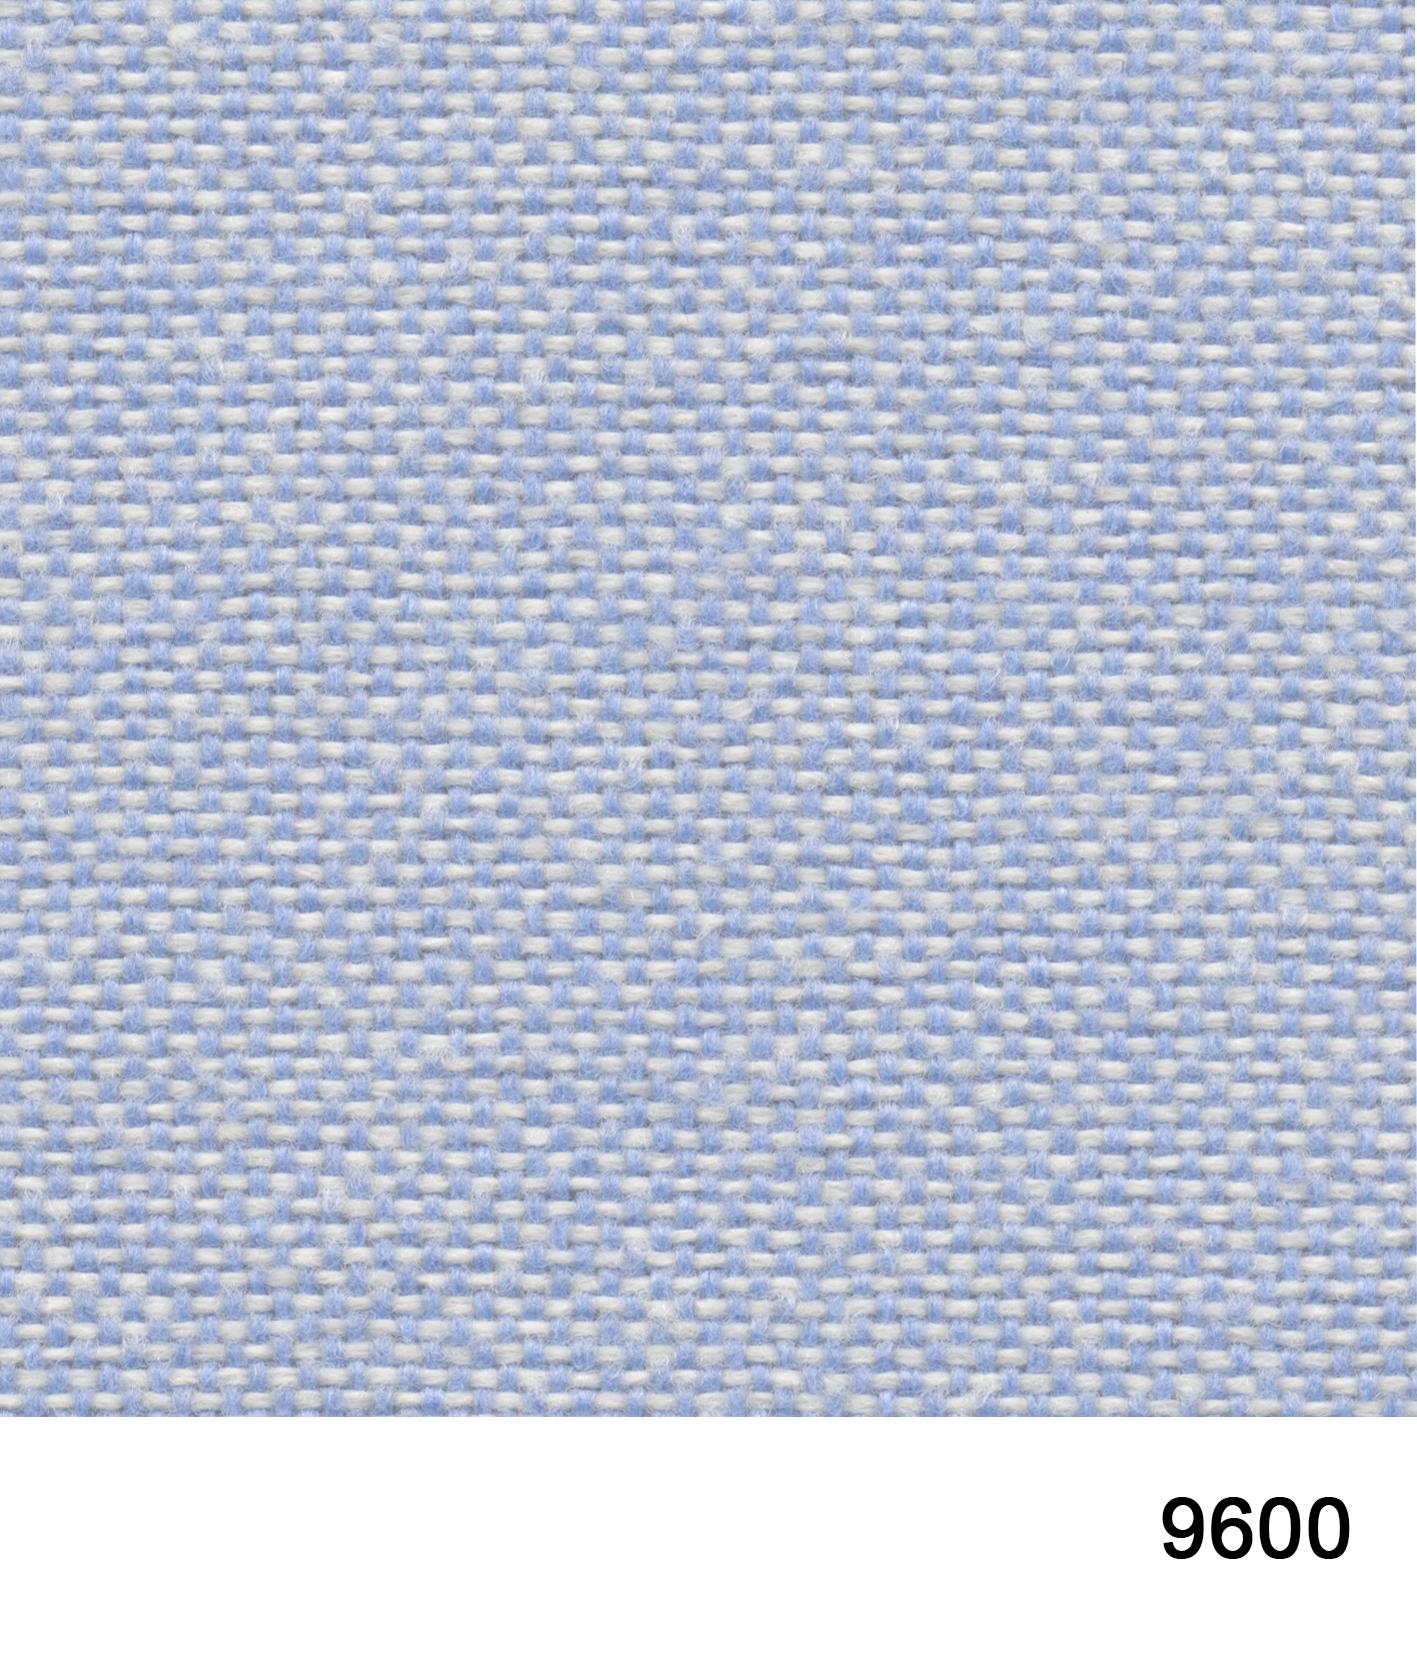 JET BIOACTIVE 3160